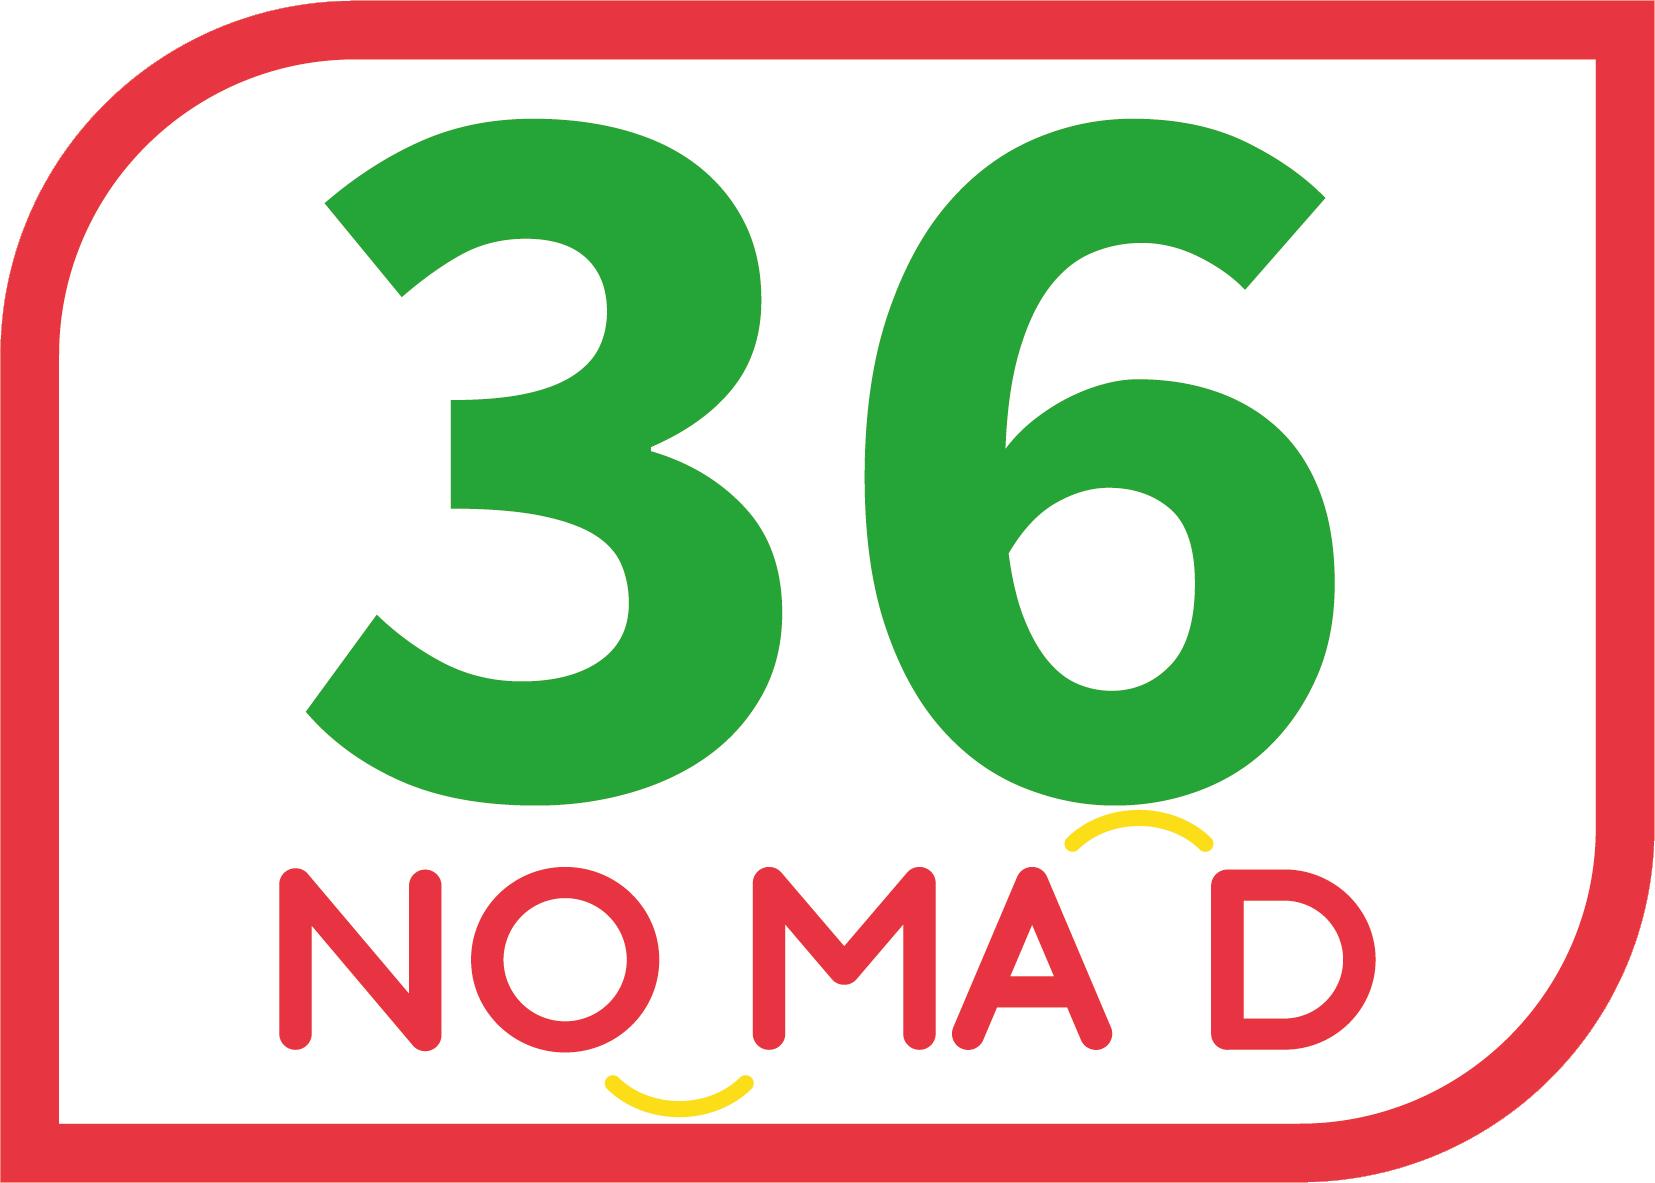 Nomad 36